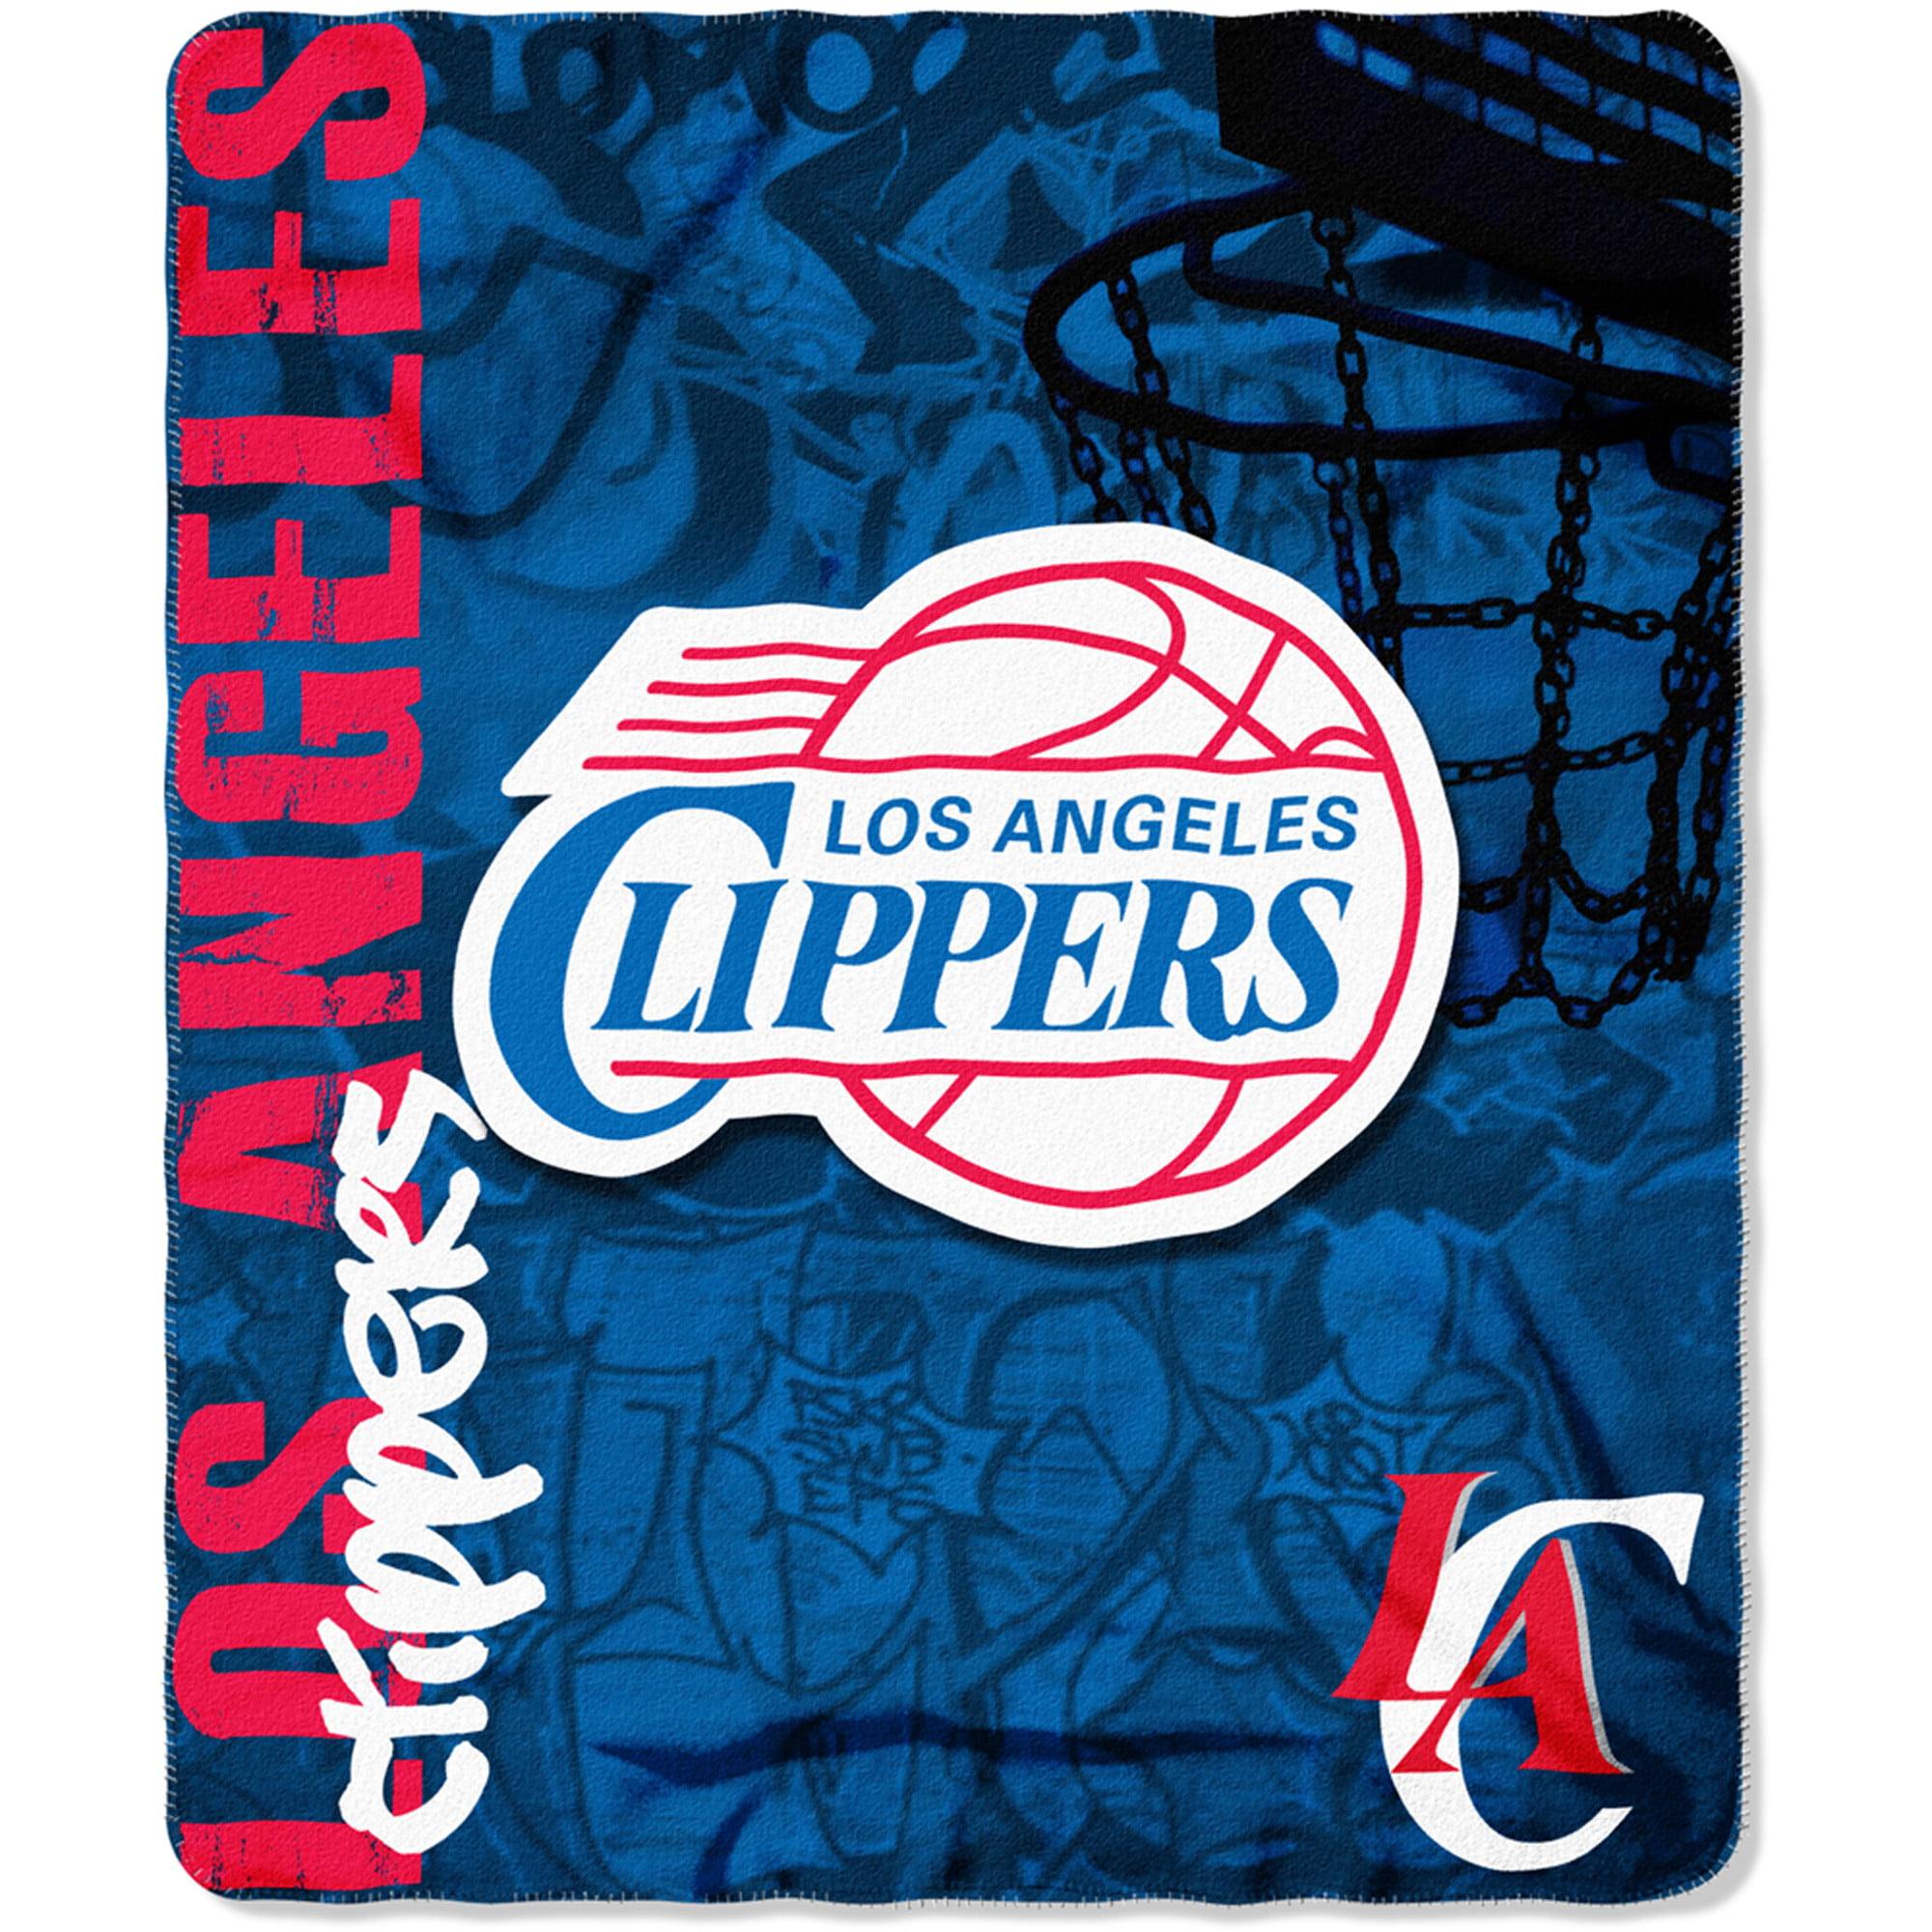 "NBA Los Angeles Clippers 50"" x 60"" Fleece Throw"